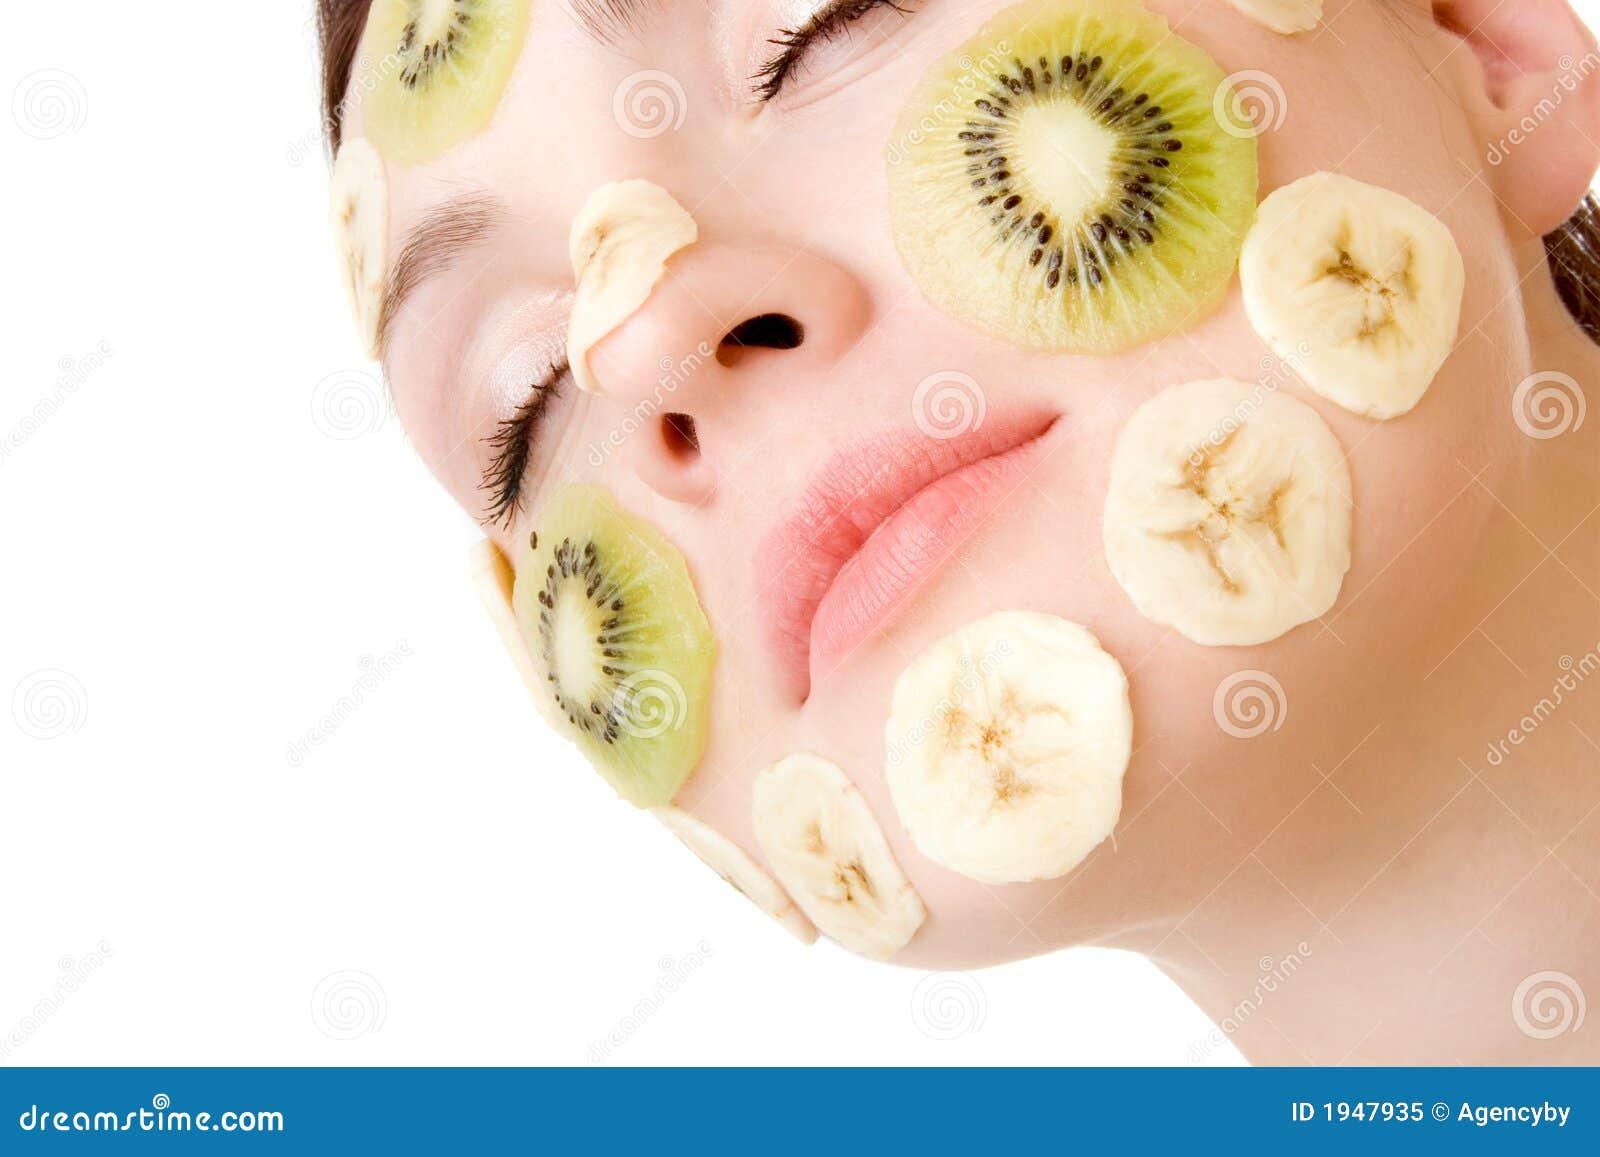 Amusing Facial fruit mask not absolutely